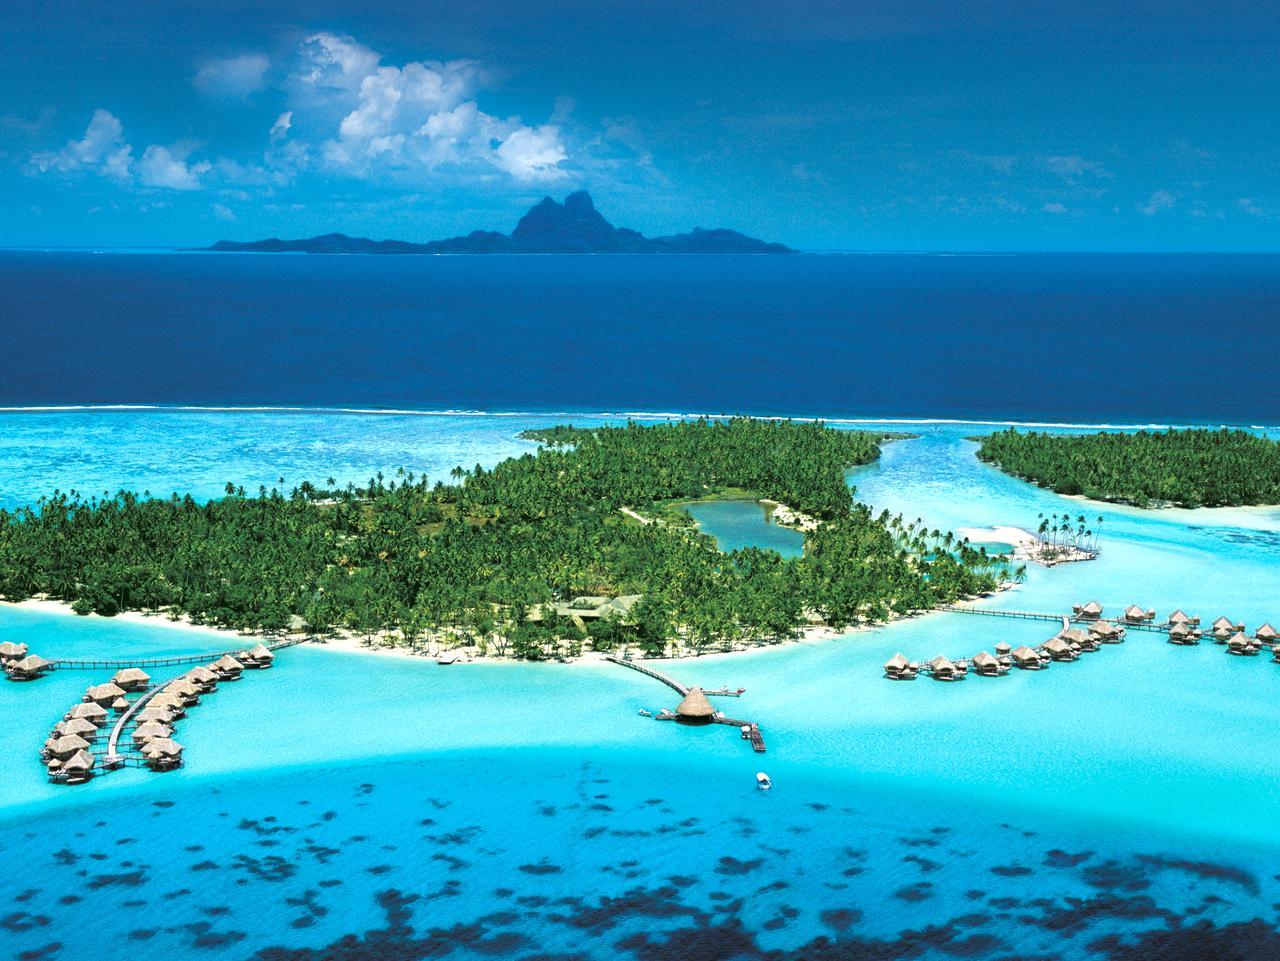 The private island in Tahiti.